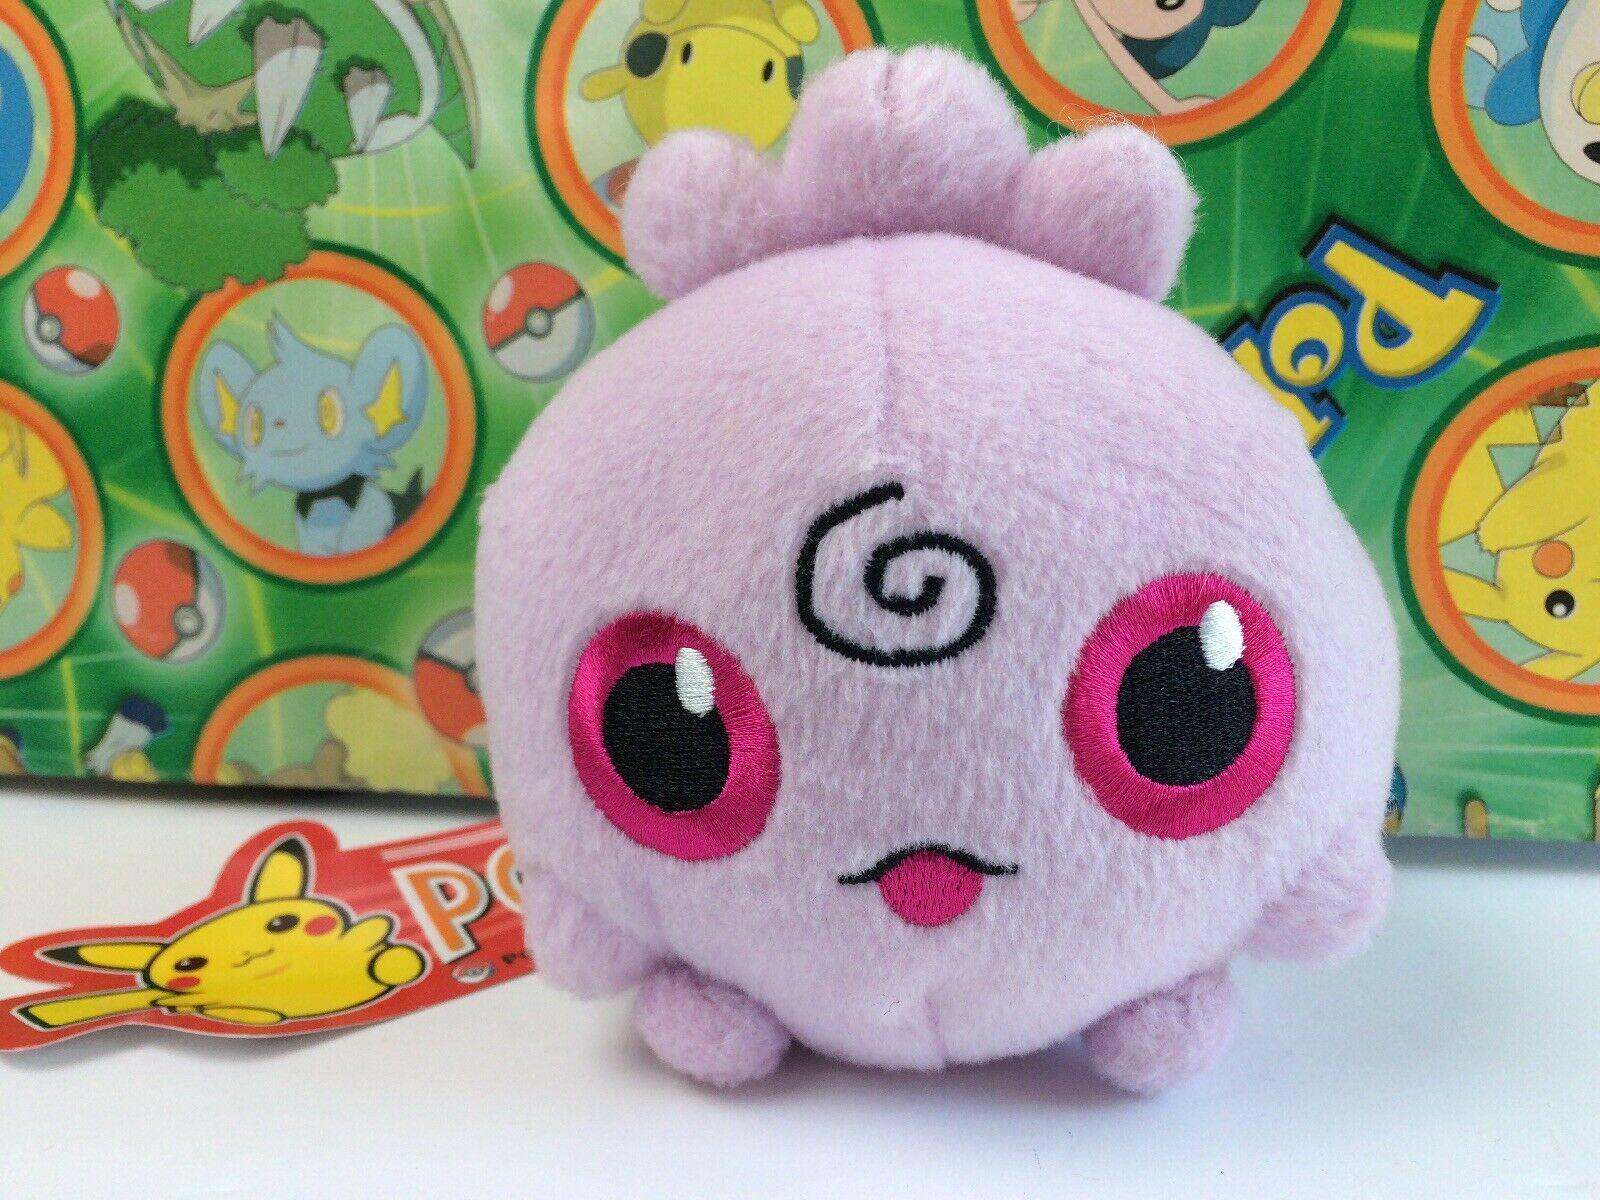 Pokey Center Plush Pokesdocka Igglybuff Doll uppstoppad figur leksak USA Seller